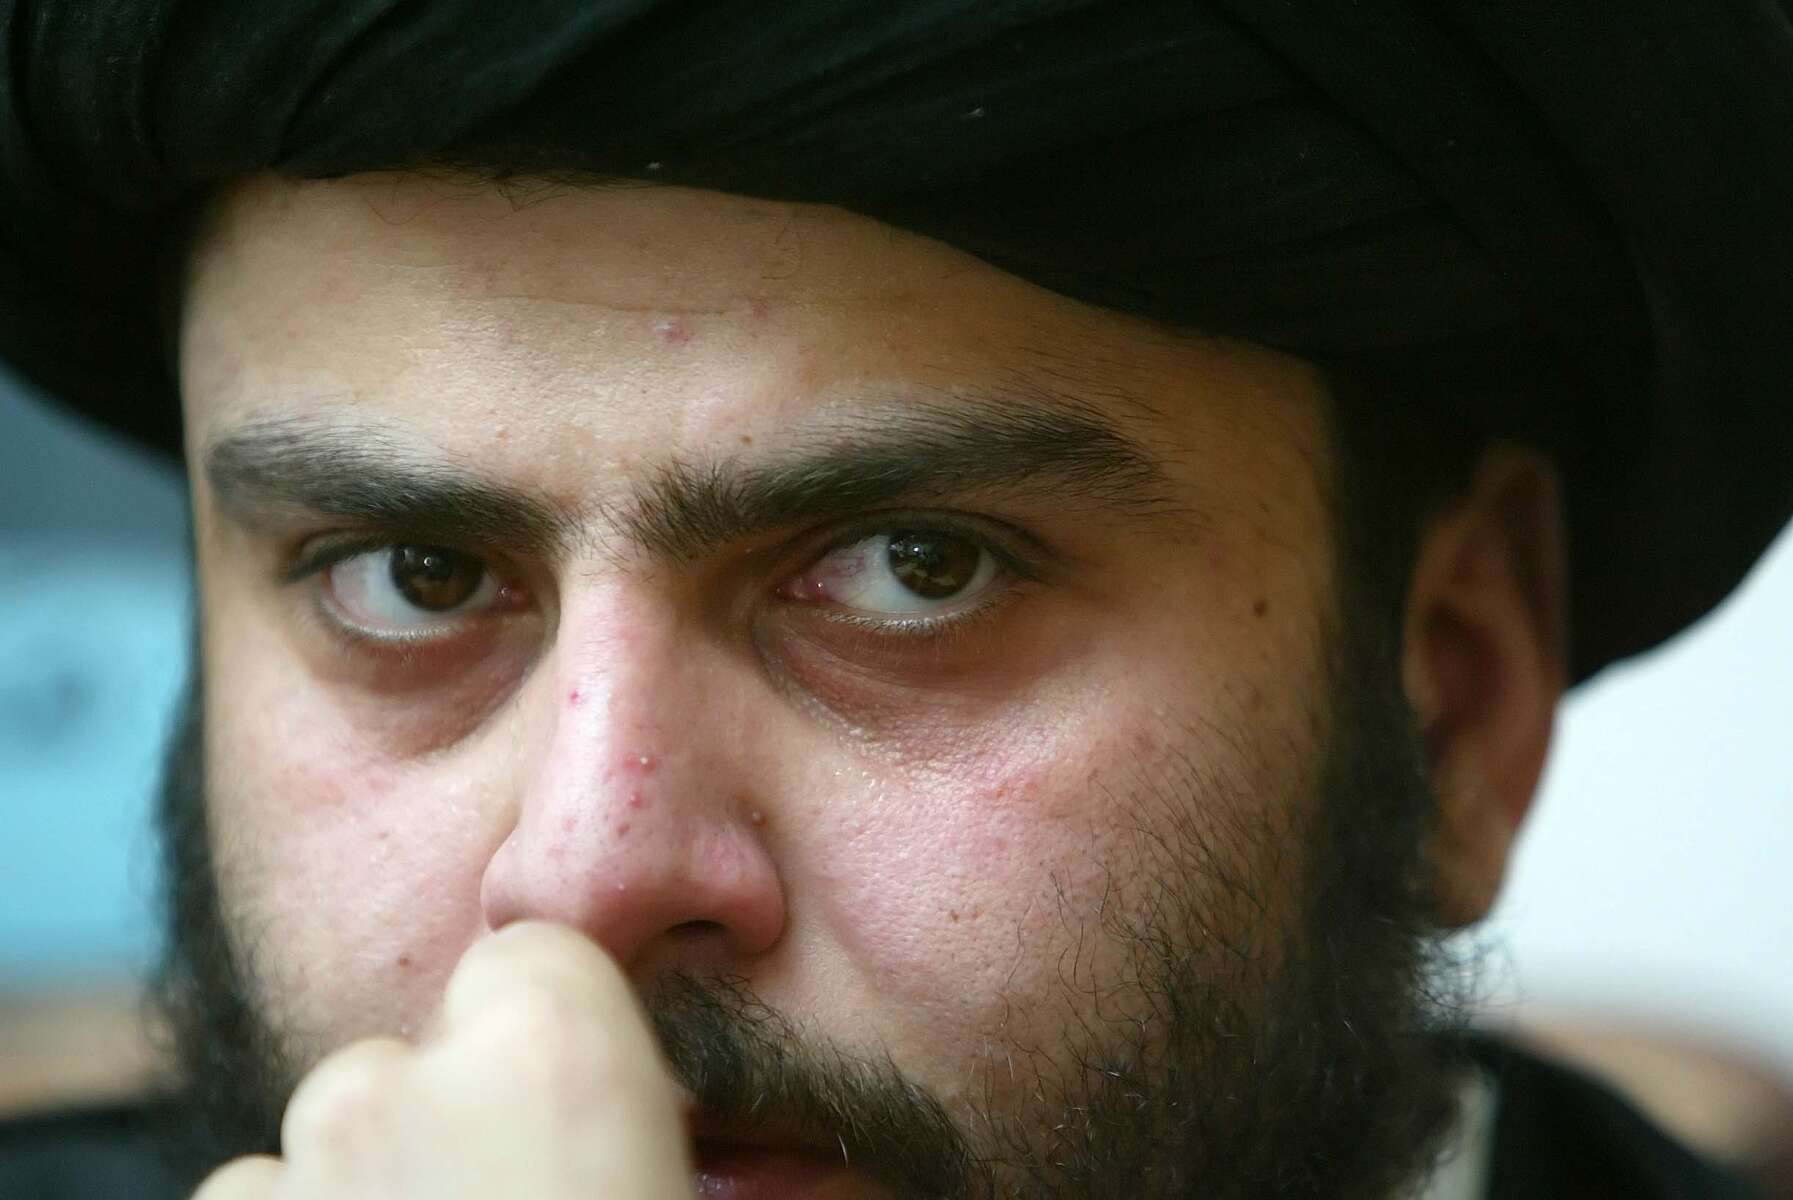 Najaf, Iraq - Muqtada al-Sadr, a shite clerical leader has tremendous influence among the predominantly Shia Islamic community of Iraq. - Ozier Muhammad / NYT